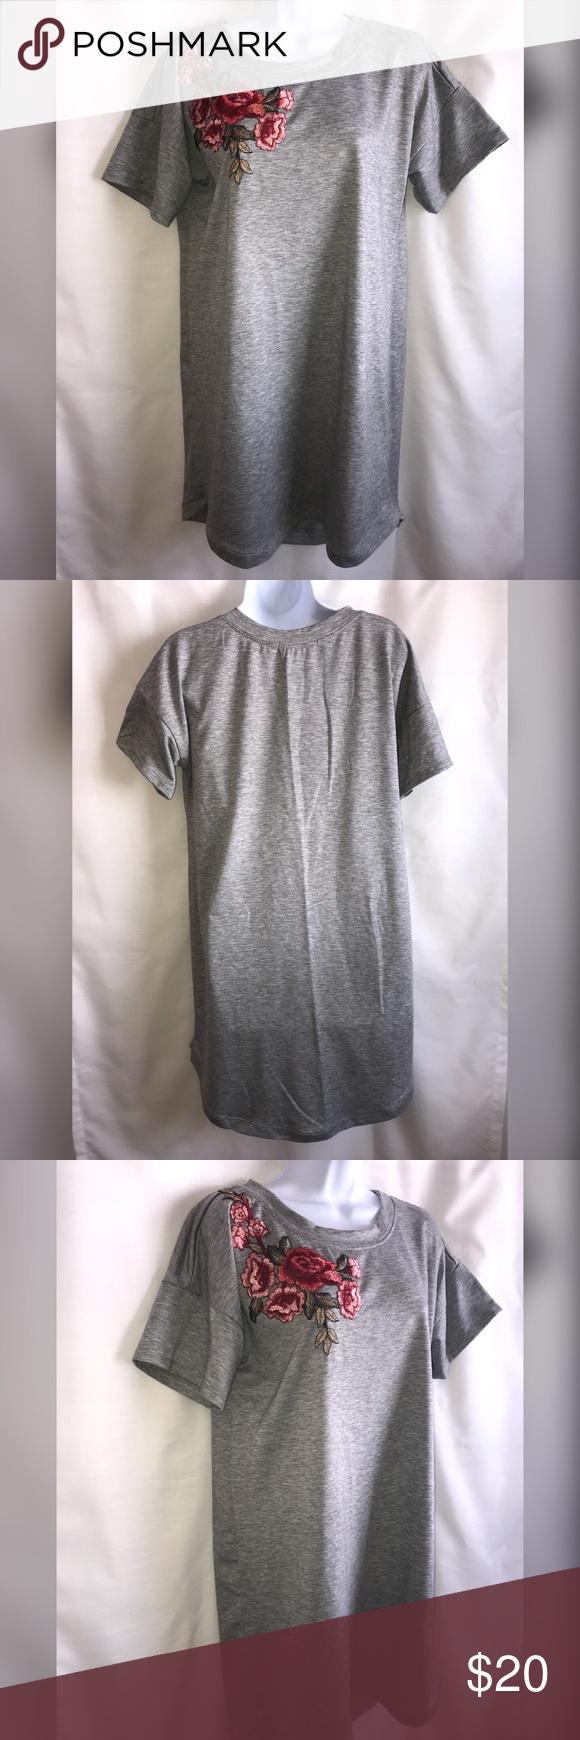 Gray tee shirt dress w floral design my posh closet pinterest